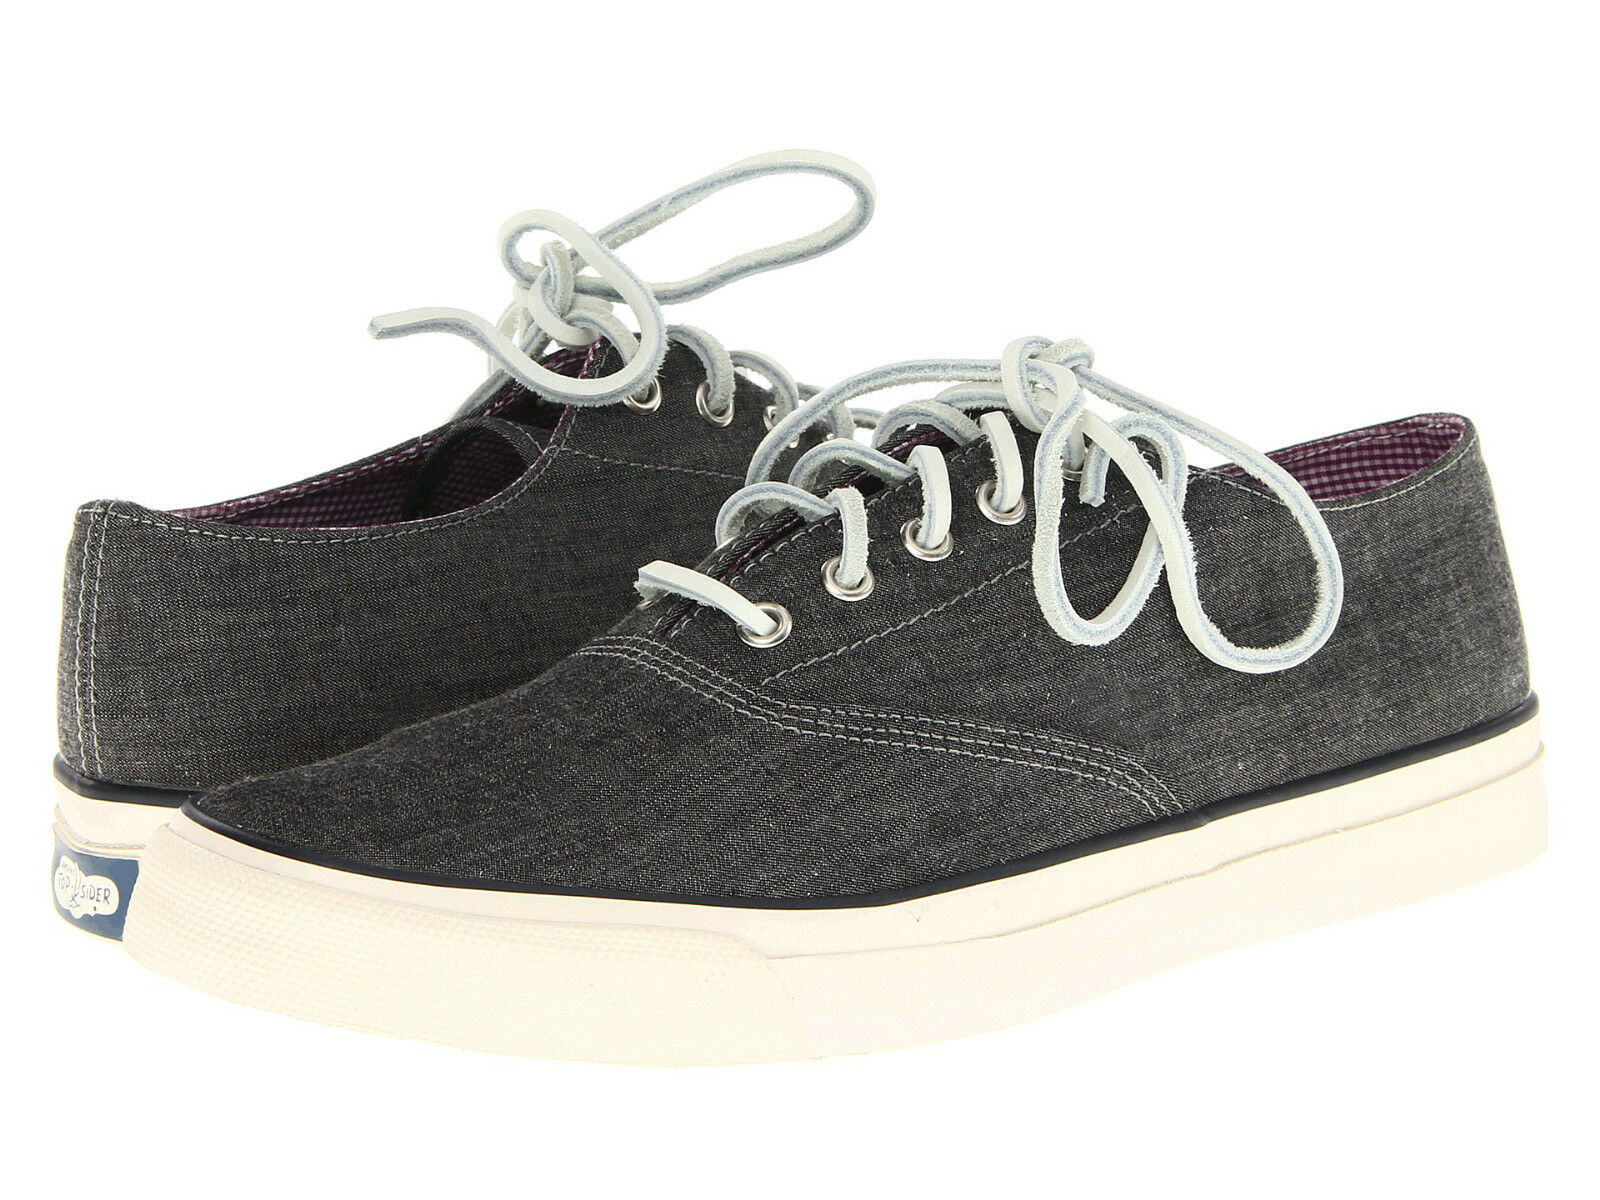 Size 8 SPERRY TOP SIDER Mens Fashion Sneaker shoes  Reg Sale LastPair